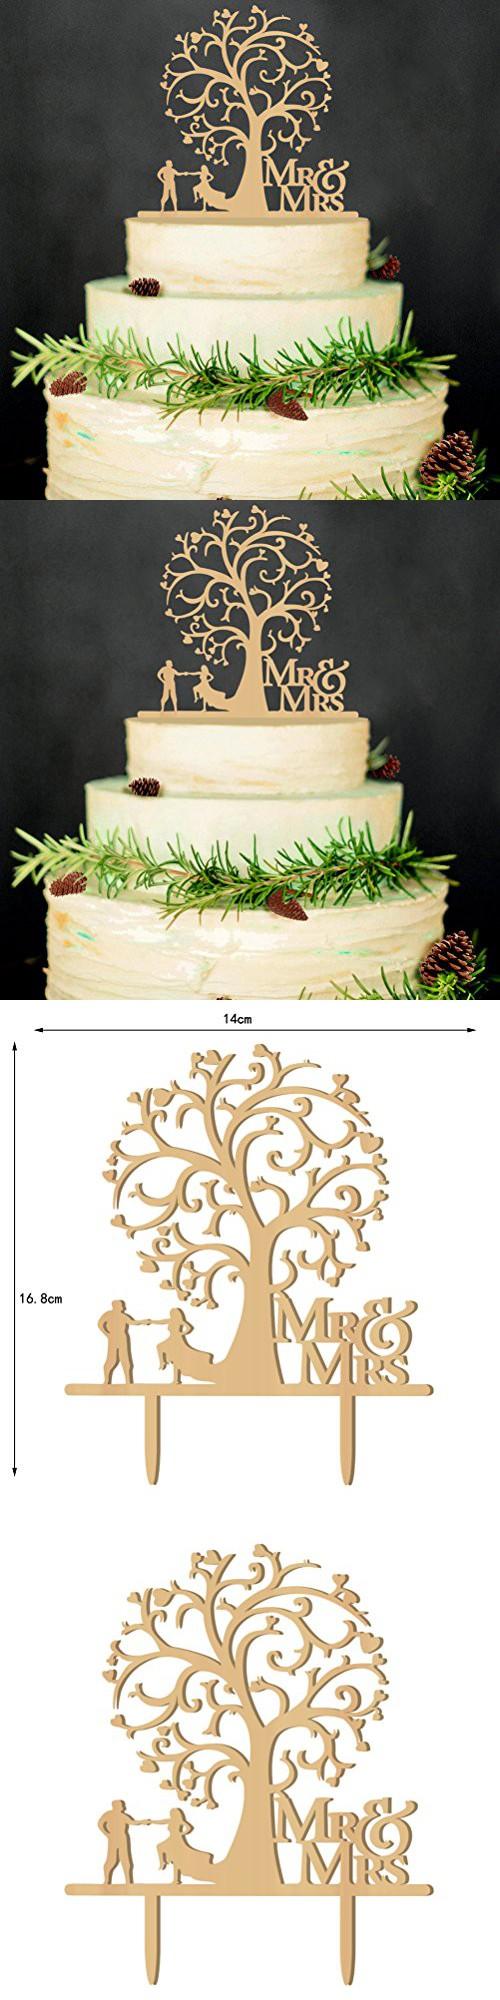 LEORX Rustic Bird Tree Wedding Cake Topper, Wood Cake Topper for ...